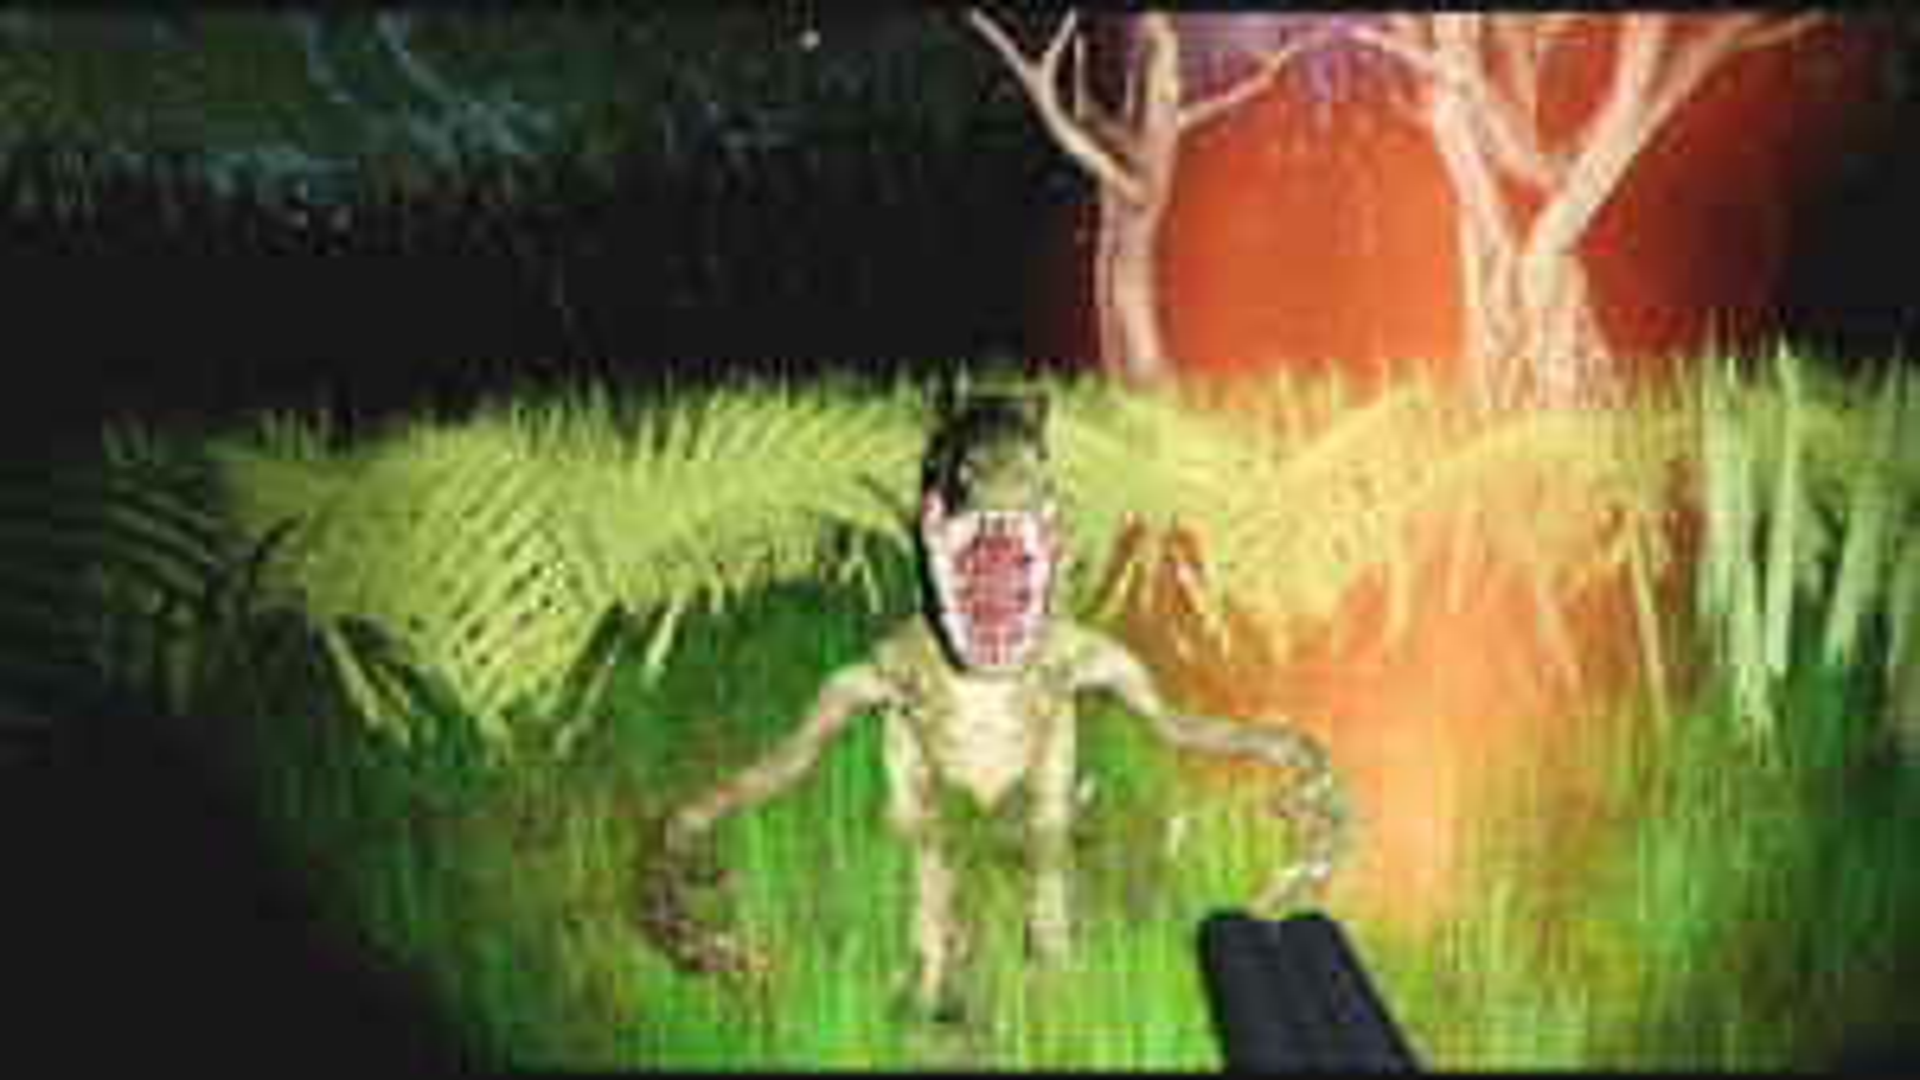 بازی هیجان انگیز و واقعیت مجازی Raptor valley 3D | فیلم